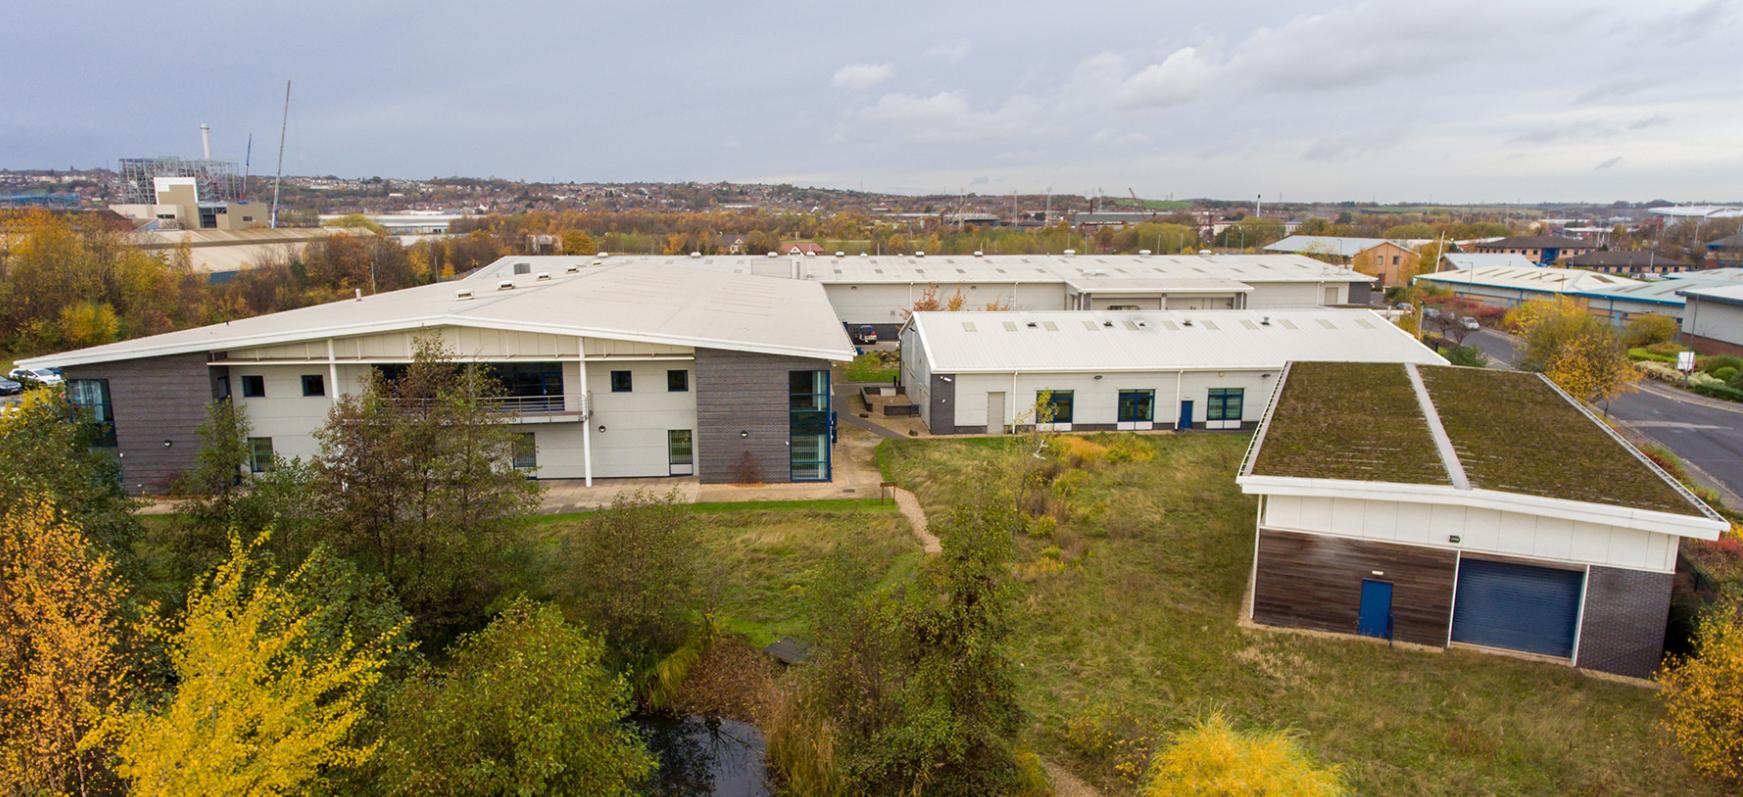 AESSEAL HQ - Mill Close Rotherham - net zero